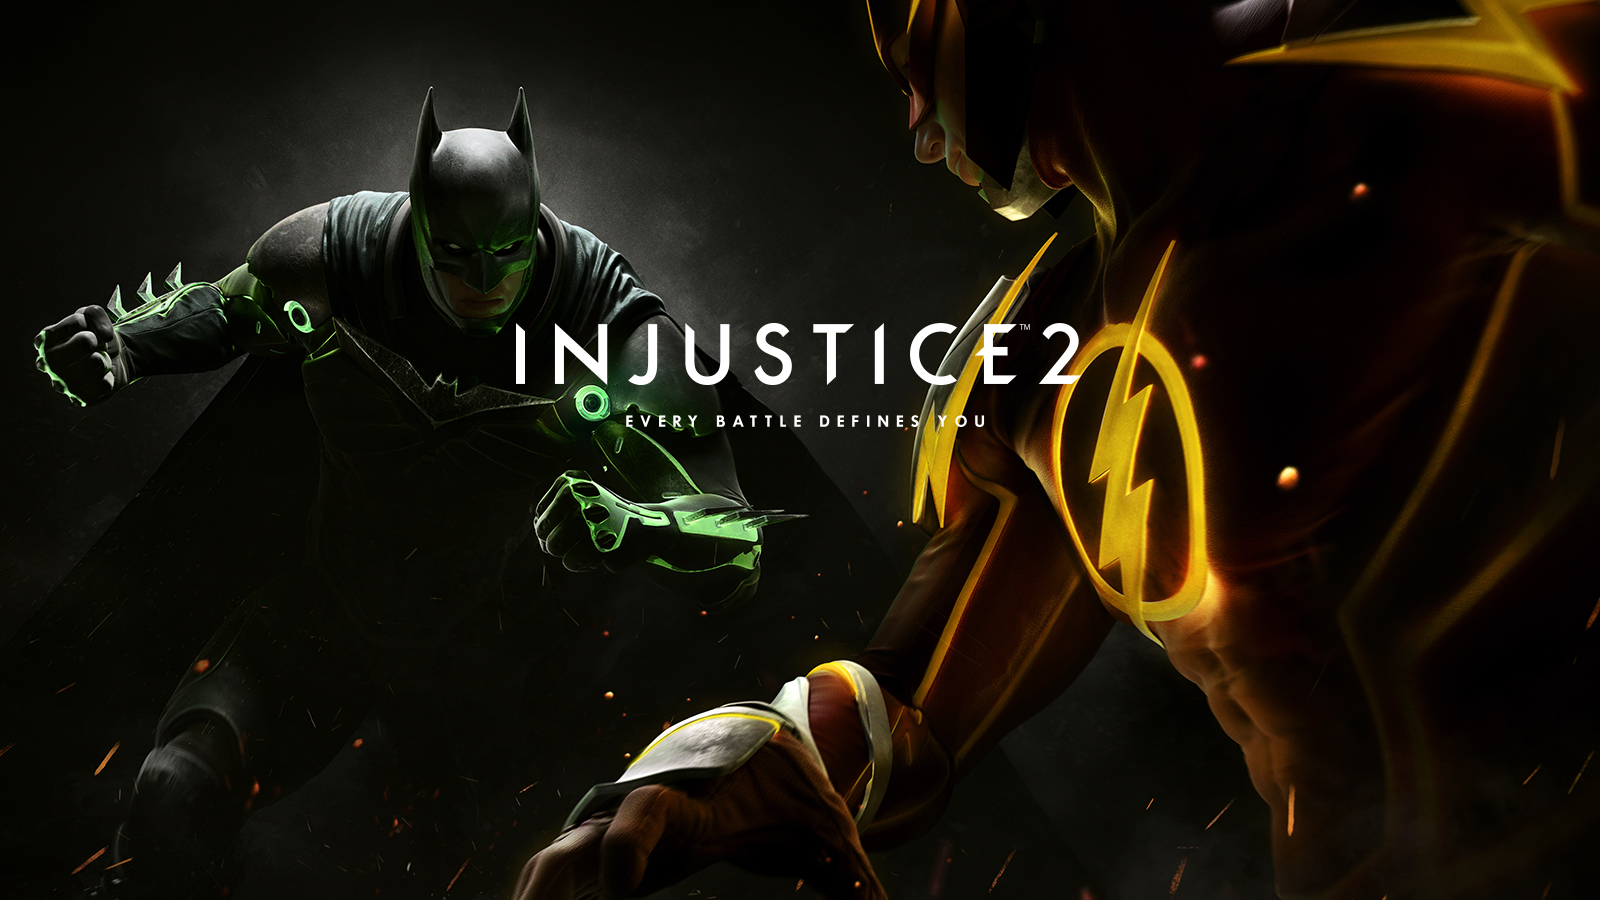 Injustice 2؛ نبرد ابرقهرمانان دی سی(DC) با یکدیگر